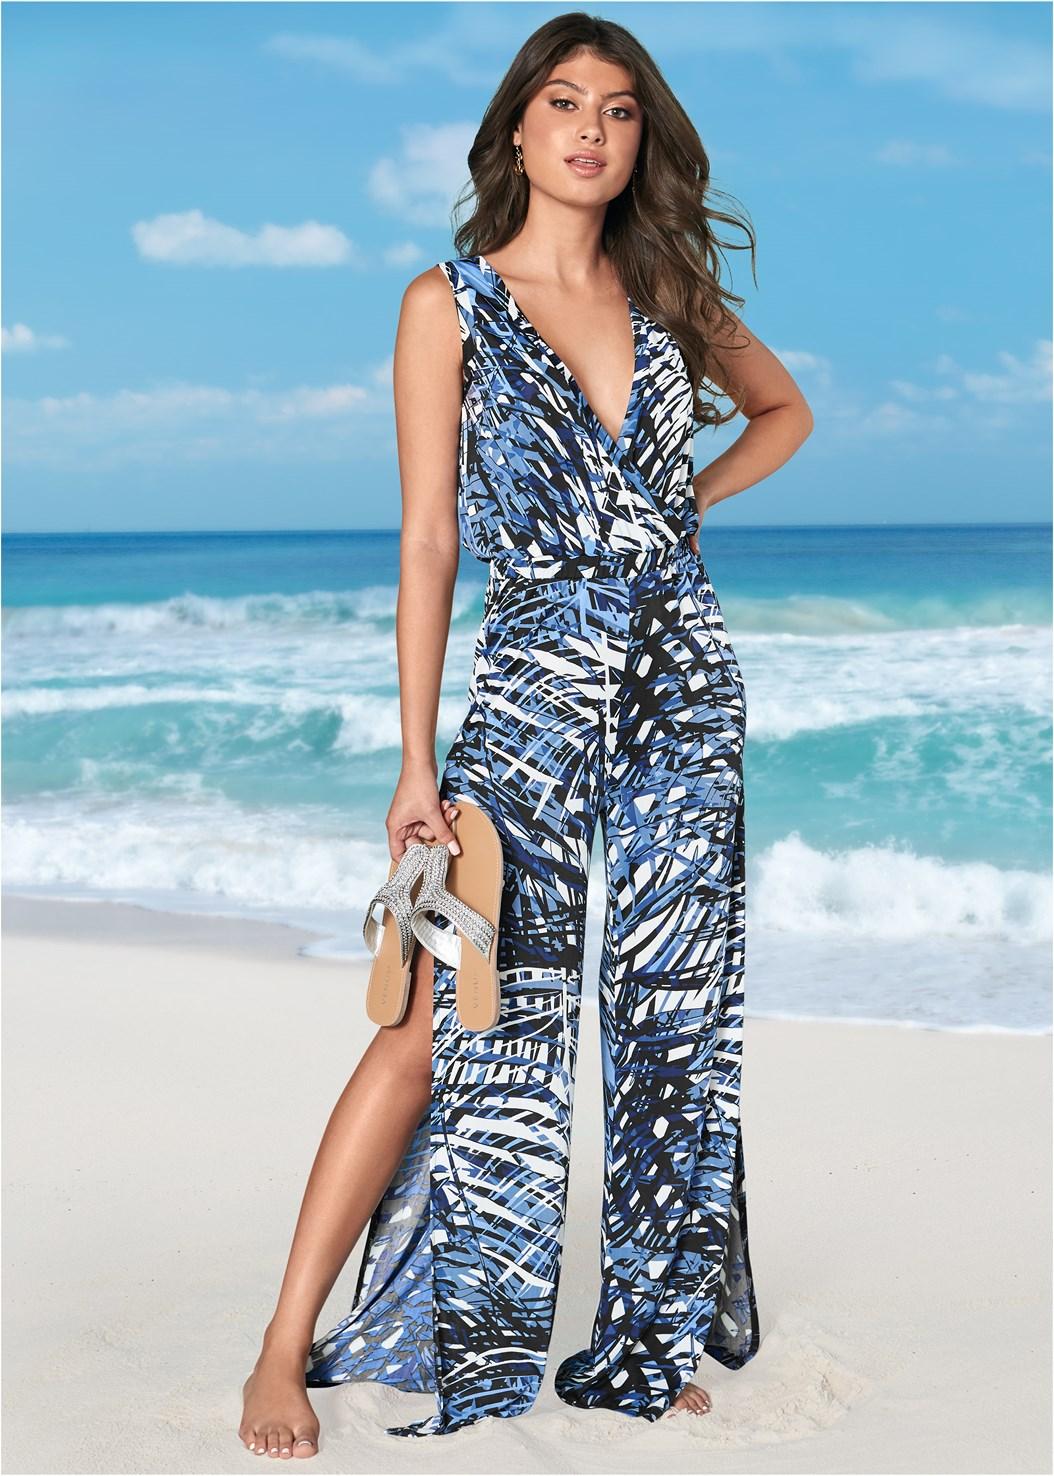 Slit Leg Jumpsuit Cover-Up,Triangle String Bikini Top,Scoop Front Bikini Bottom